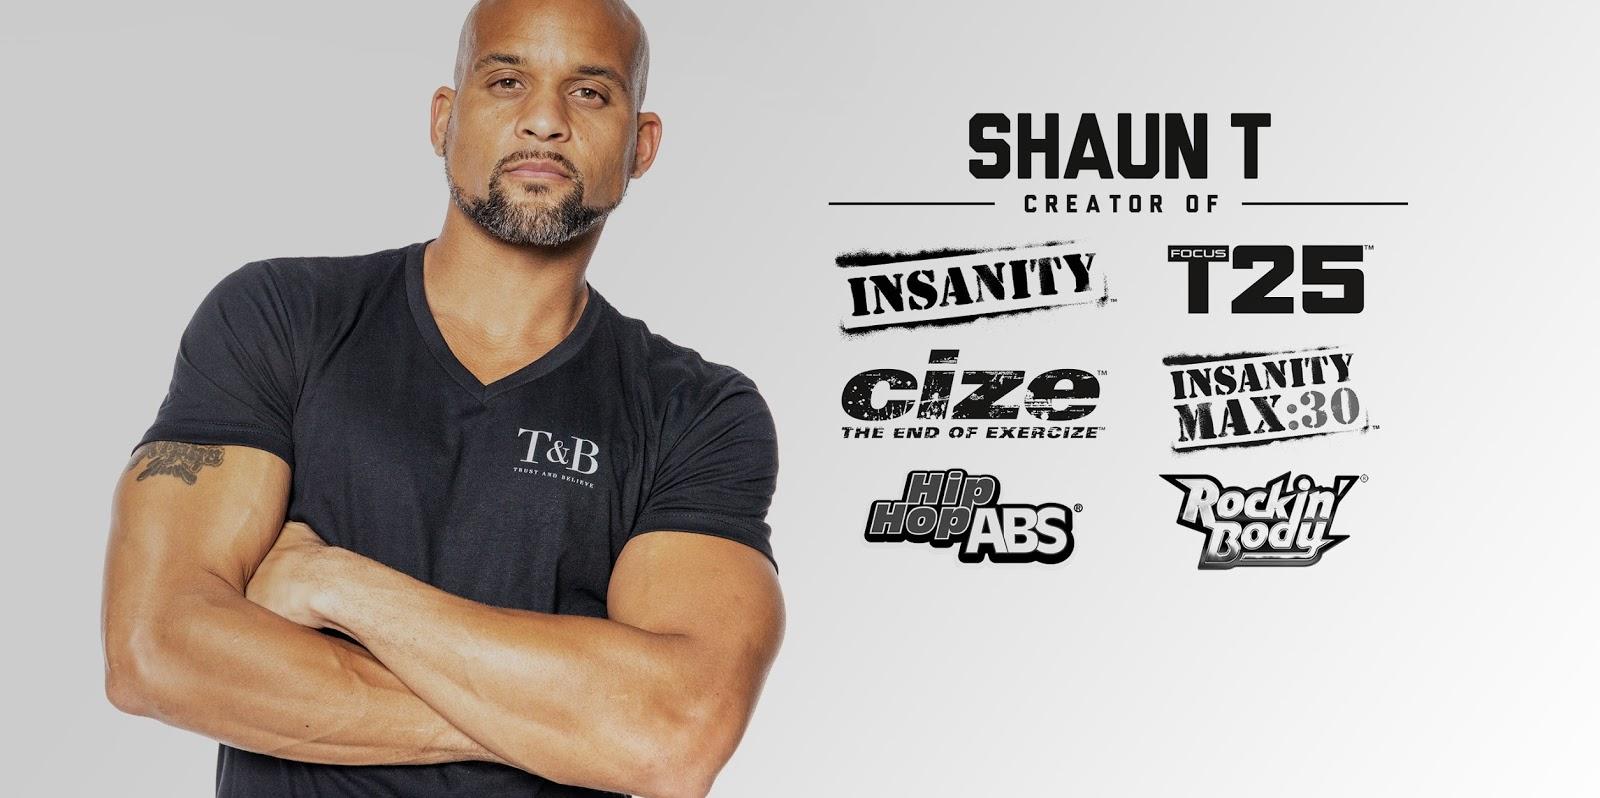 Shaun Week: Shaun T is Back! | Shape Your Life